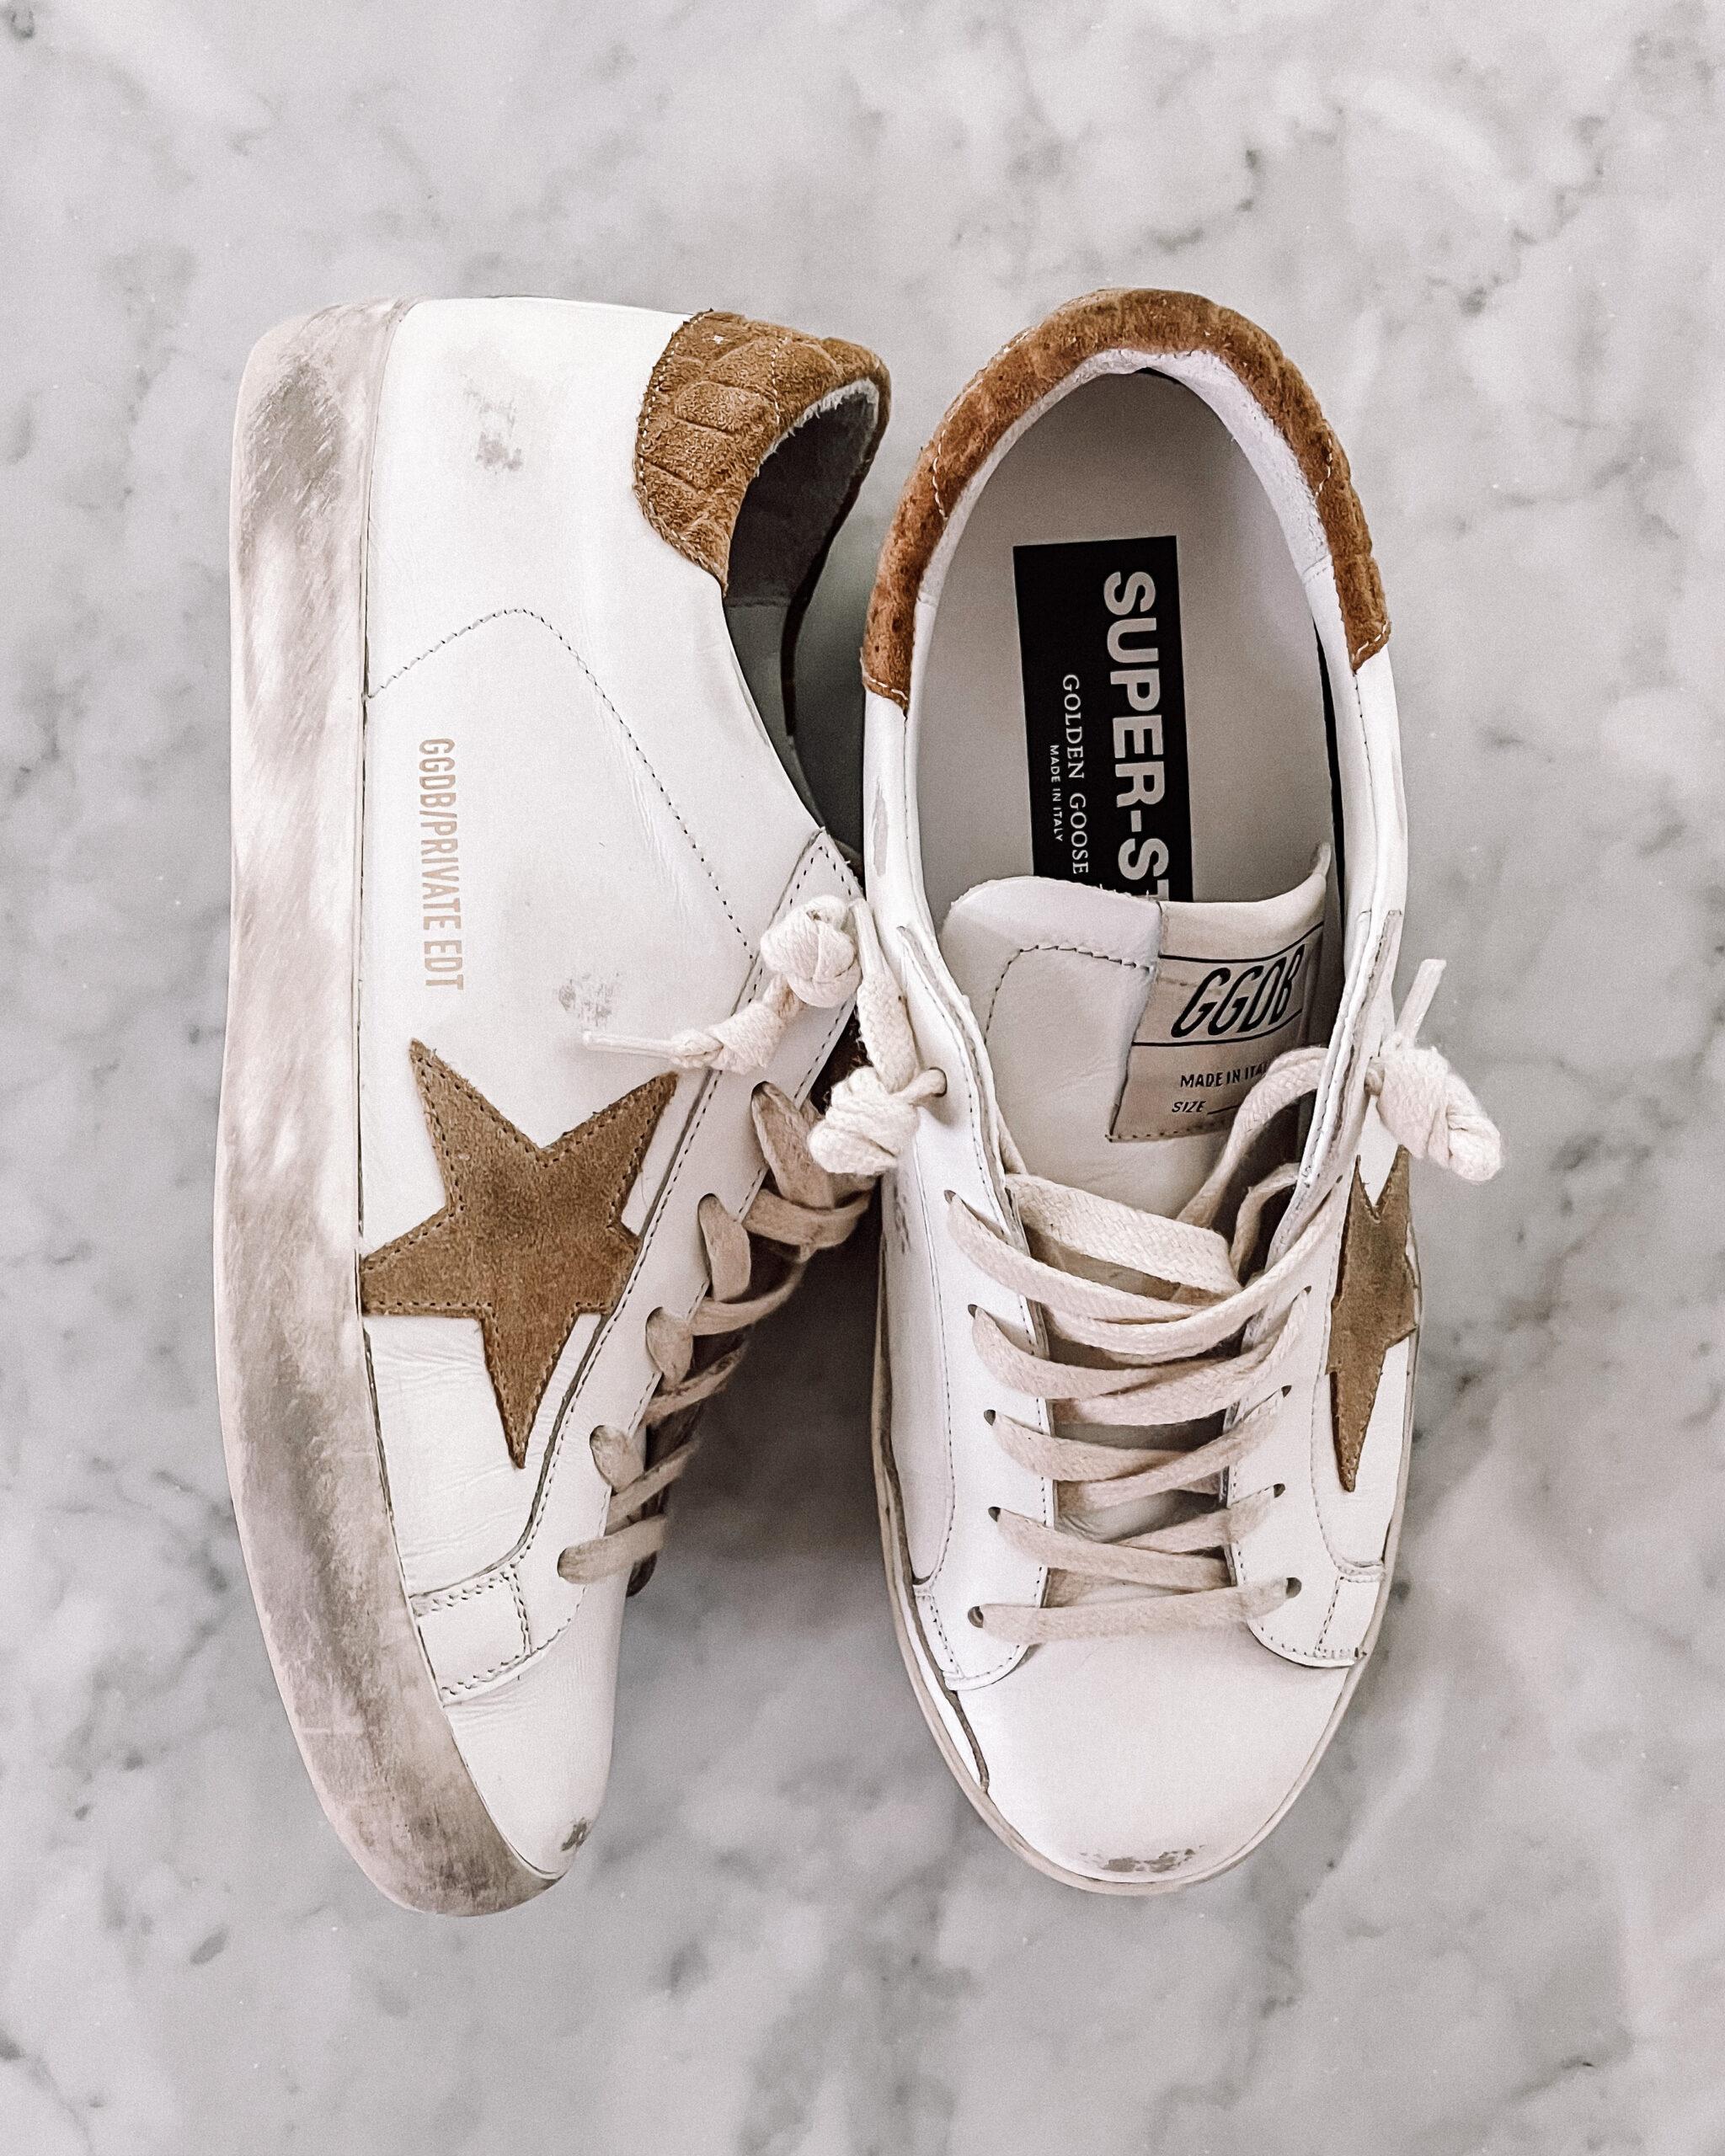 Fashion Jackson Golden Goose Superstar Sneakers